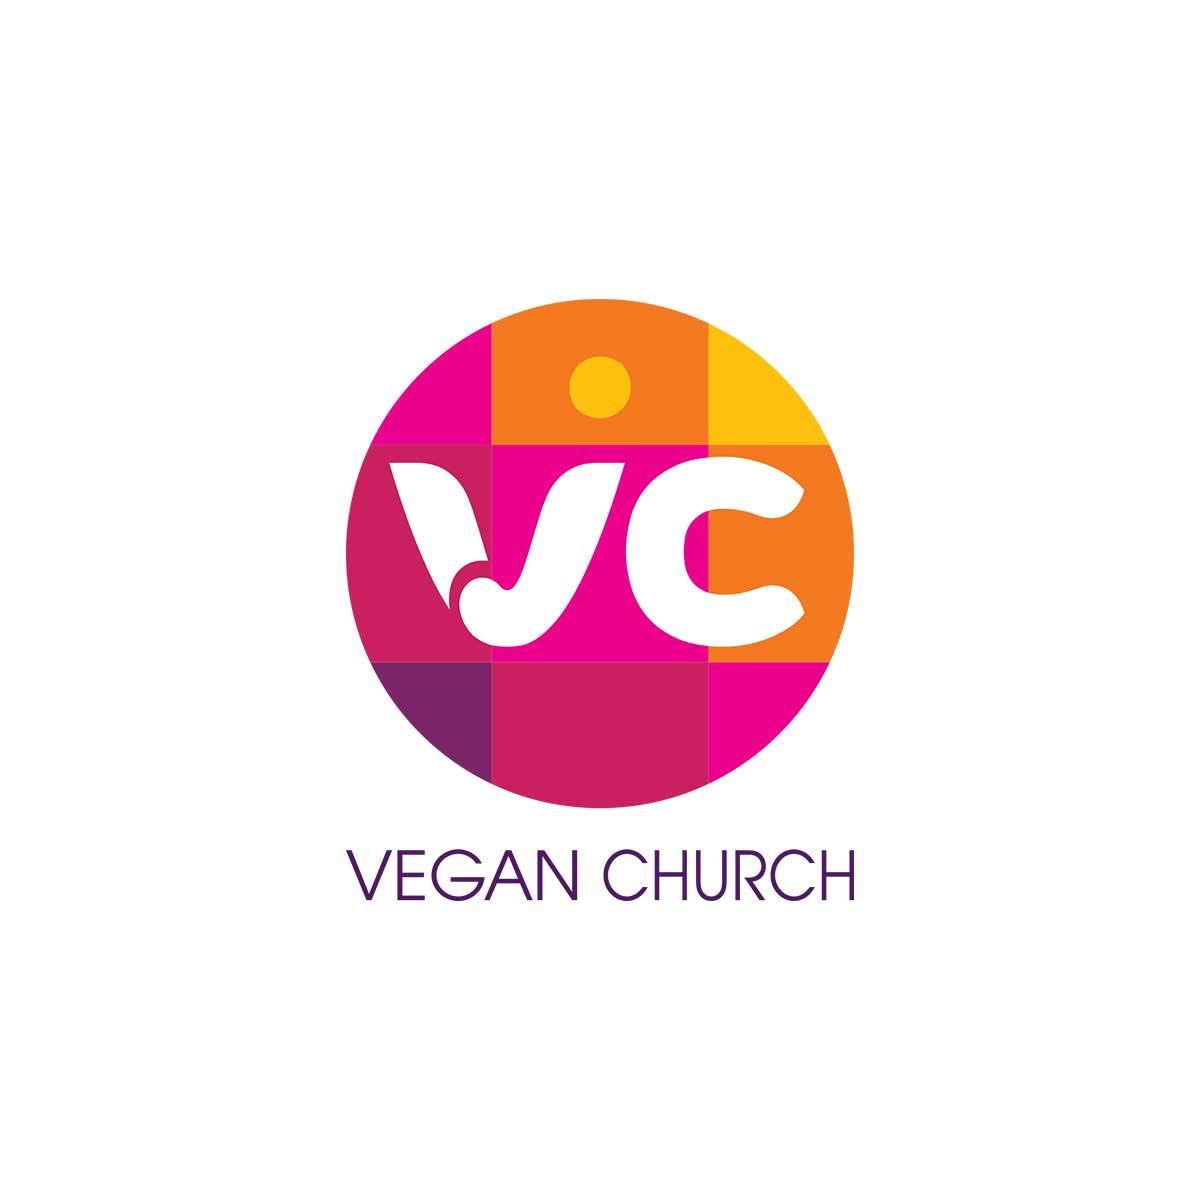 logo vegan church